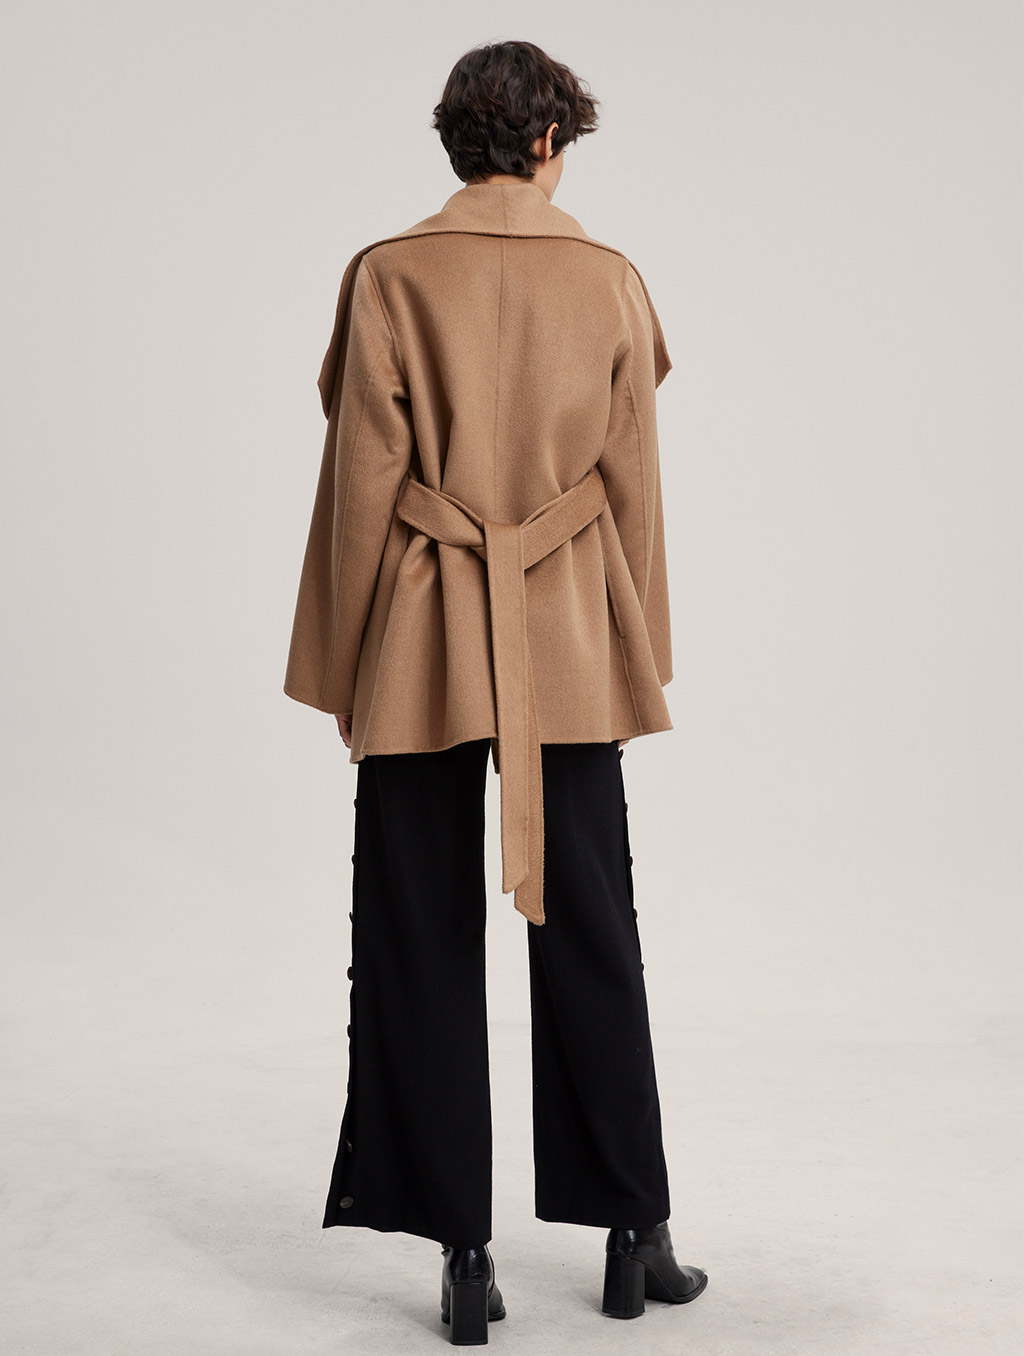 Waisted Belted 100% Camel Hair Coat - Camel, S